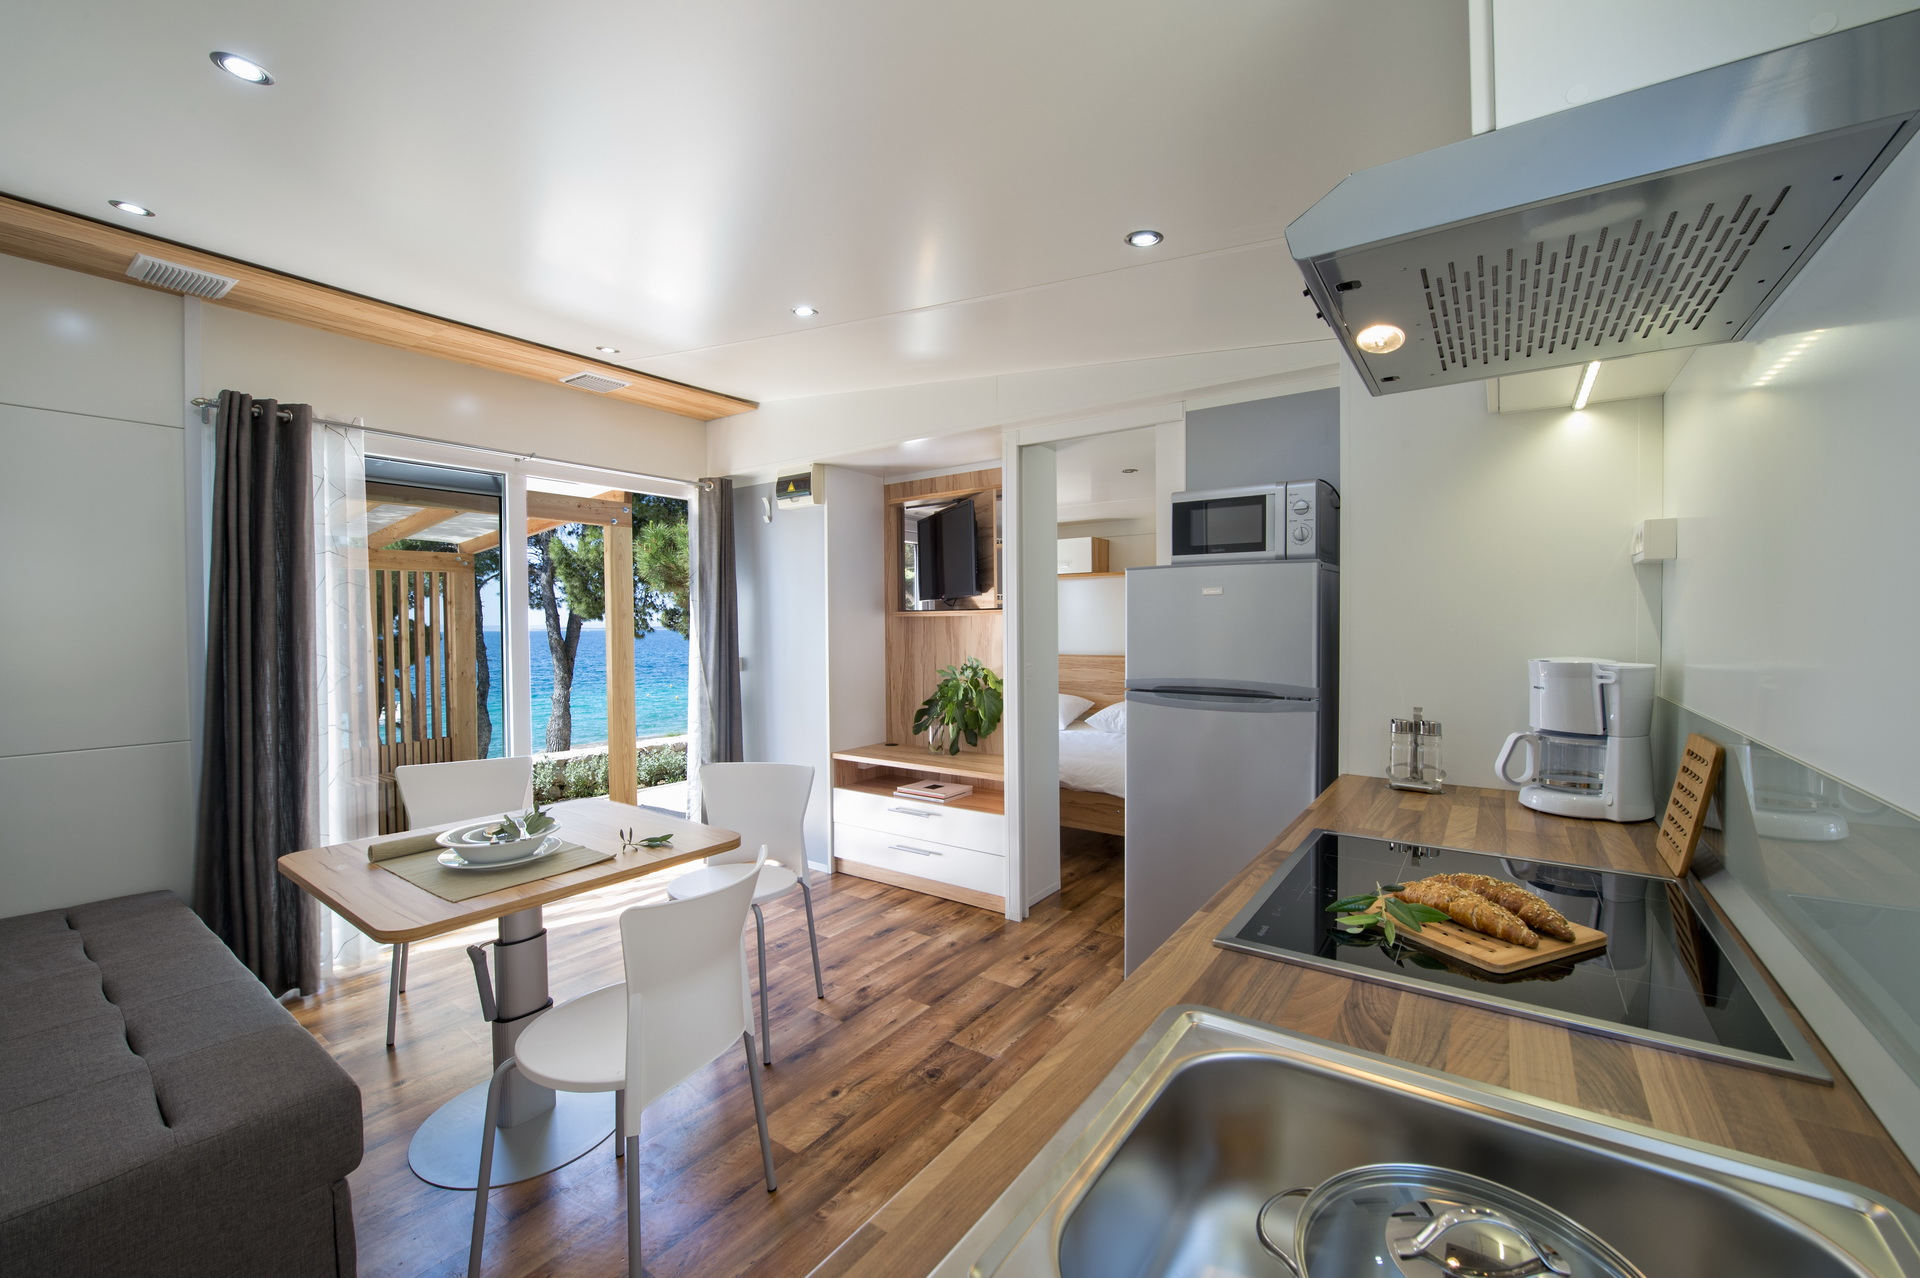 adria village kozarica adria holidays. Black Bedroom Furniture Sets. Home Design Ideas